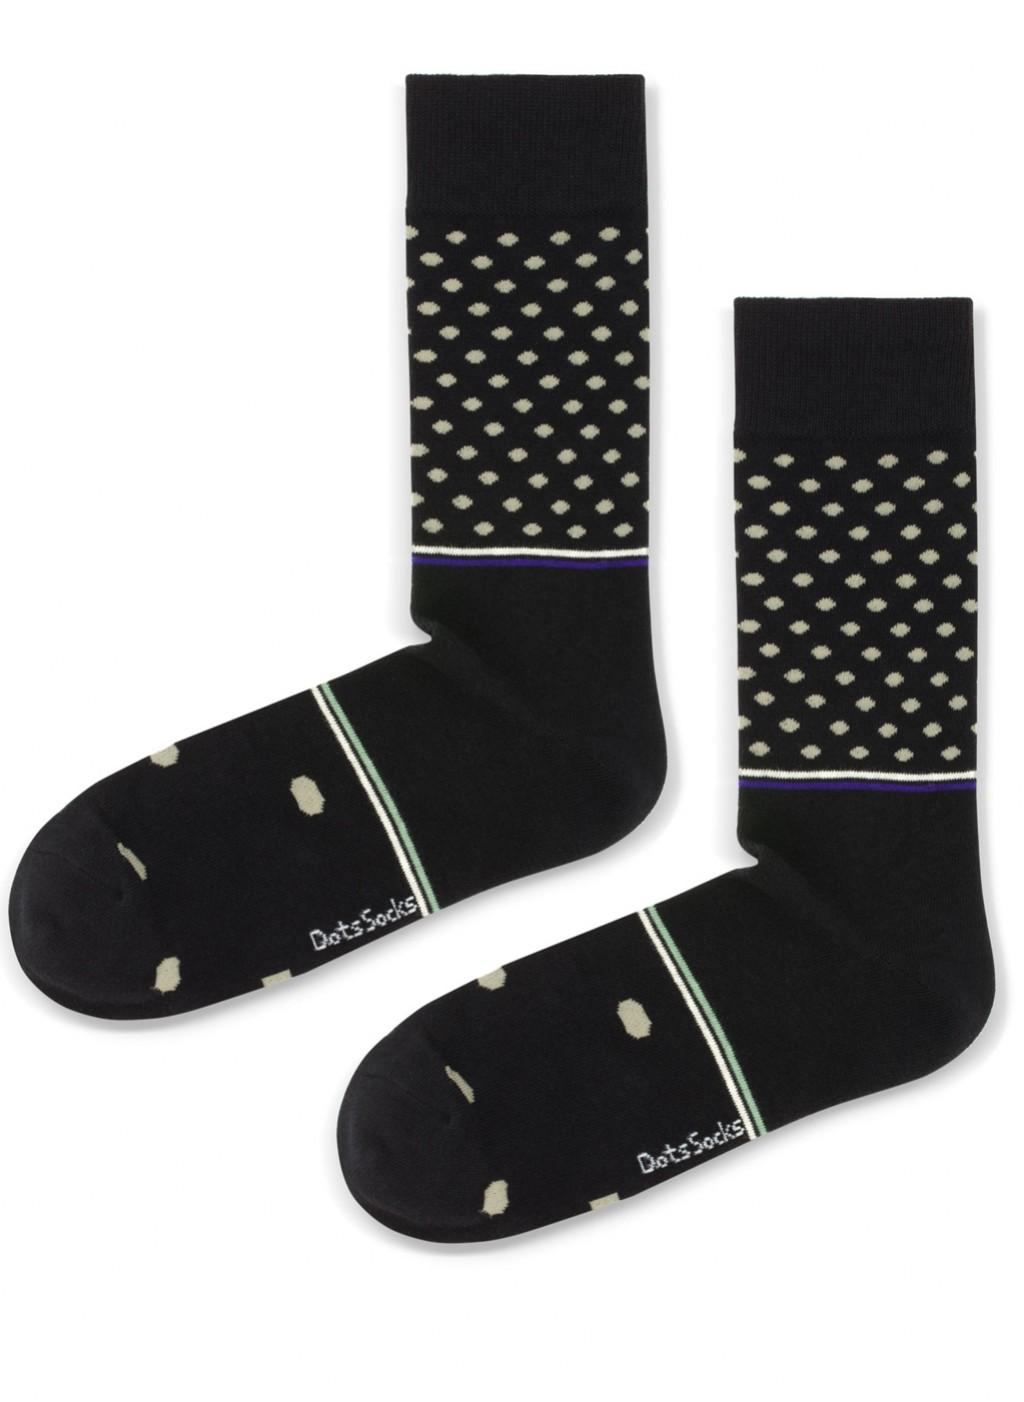 Шкарпетки DTS-SX-069-X